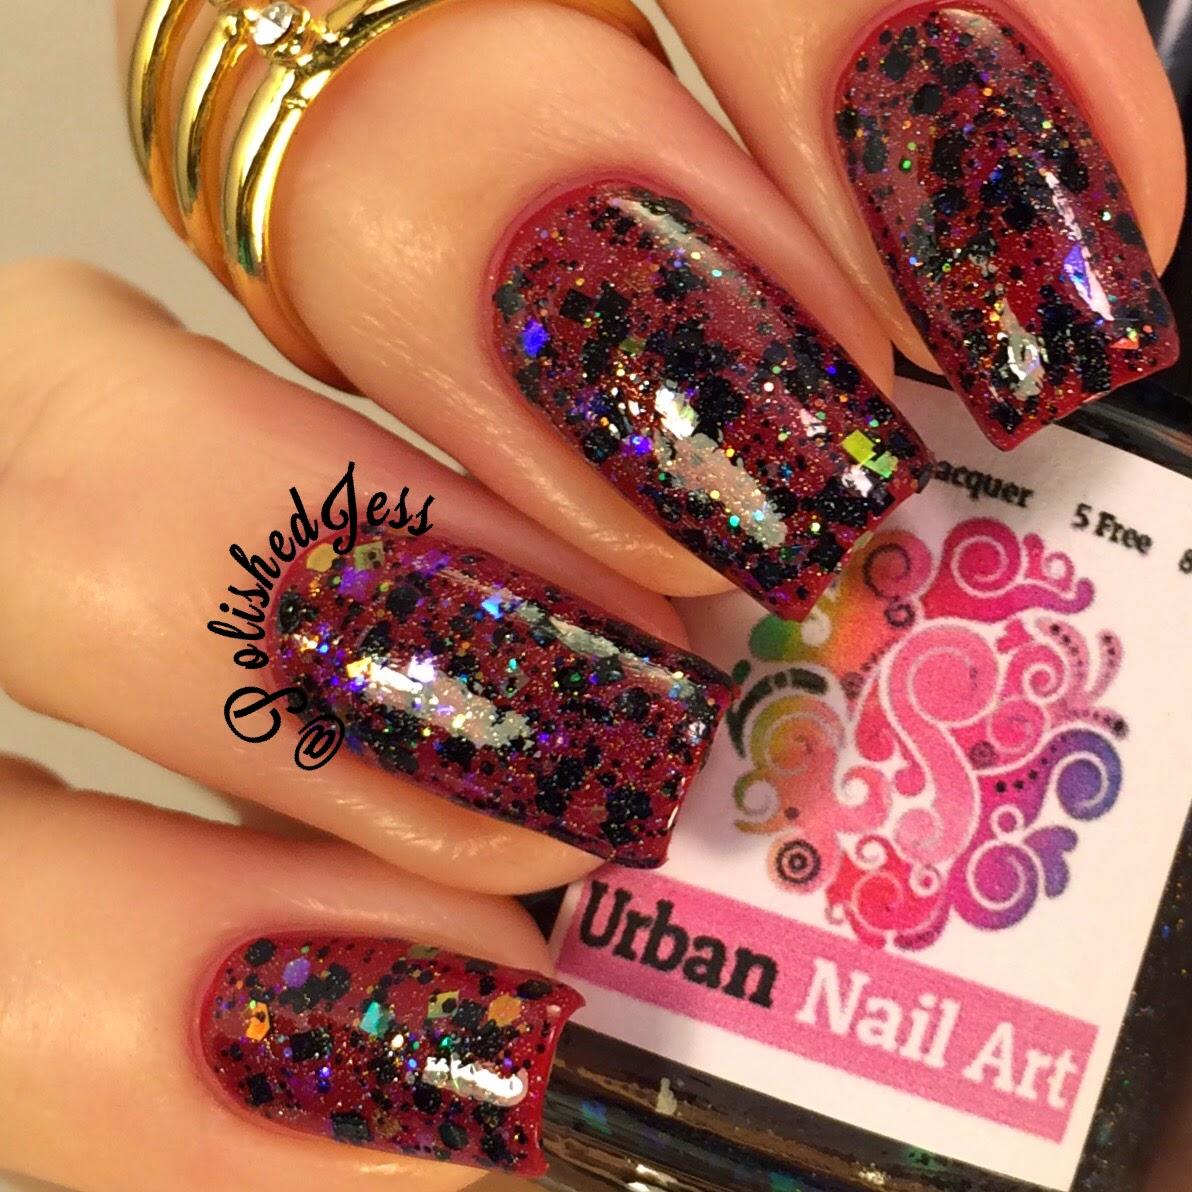 Polished Jess Urban Nail Art Selections